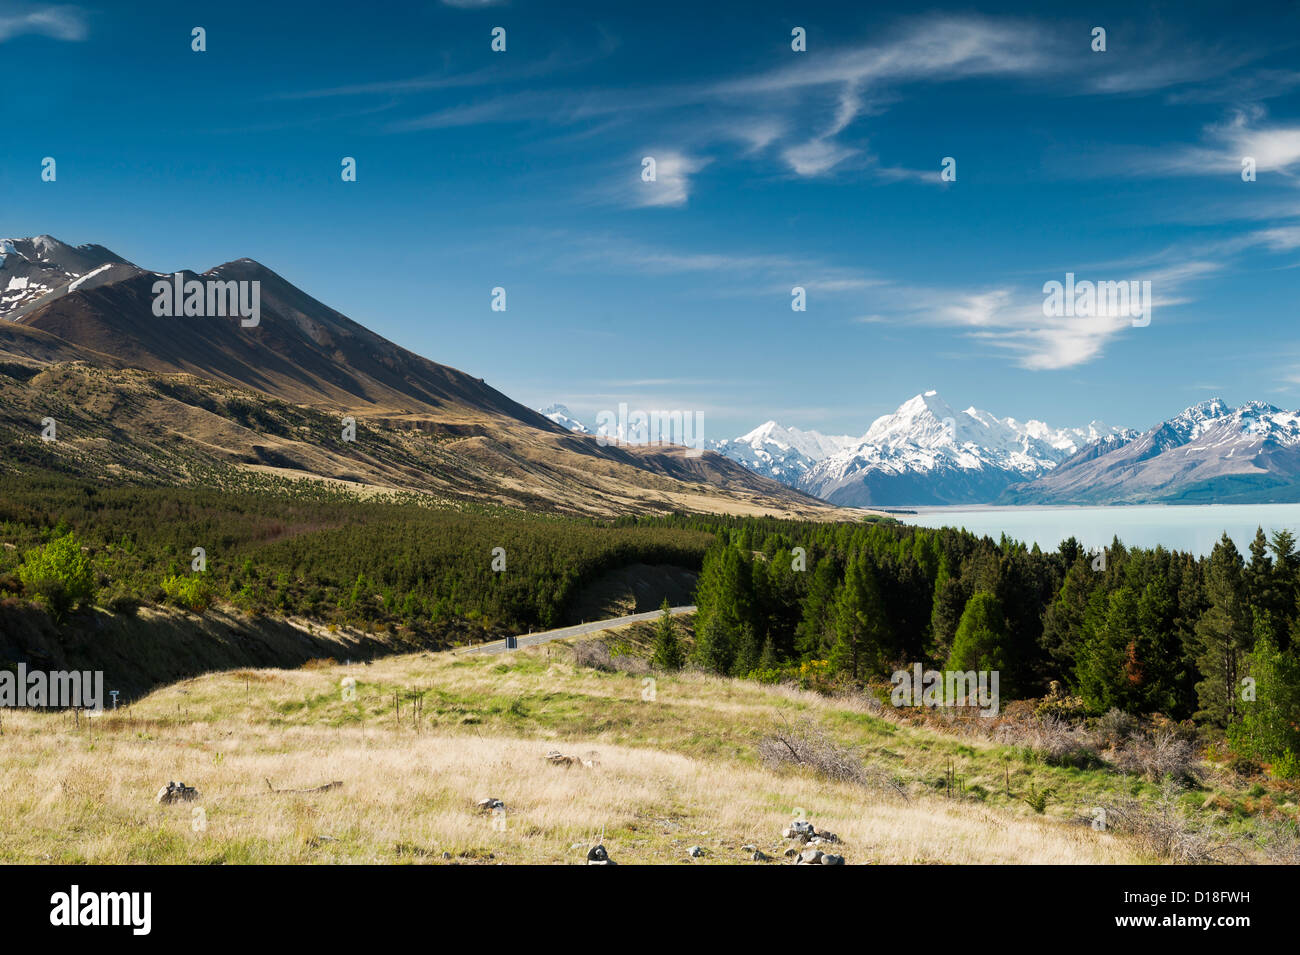 Dirt road in rural landscape - Stock Image